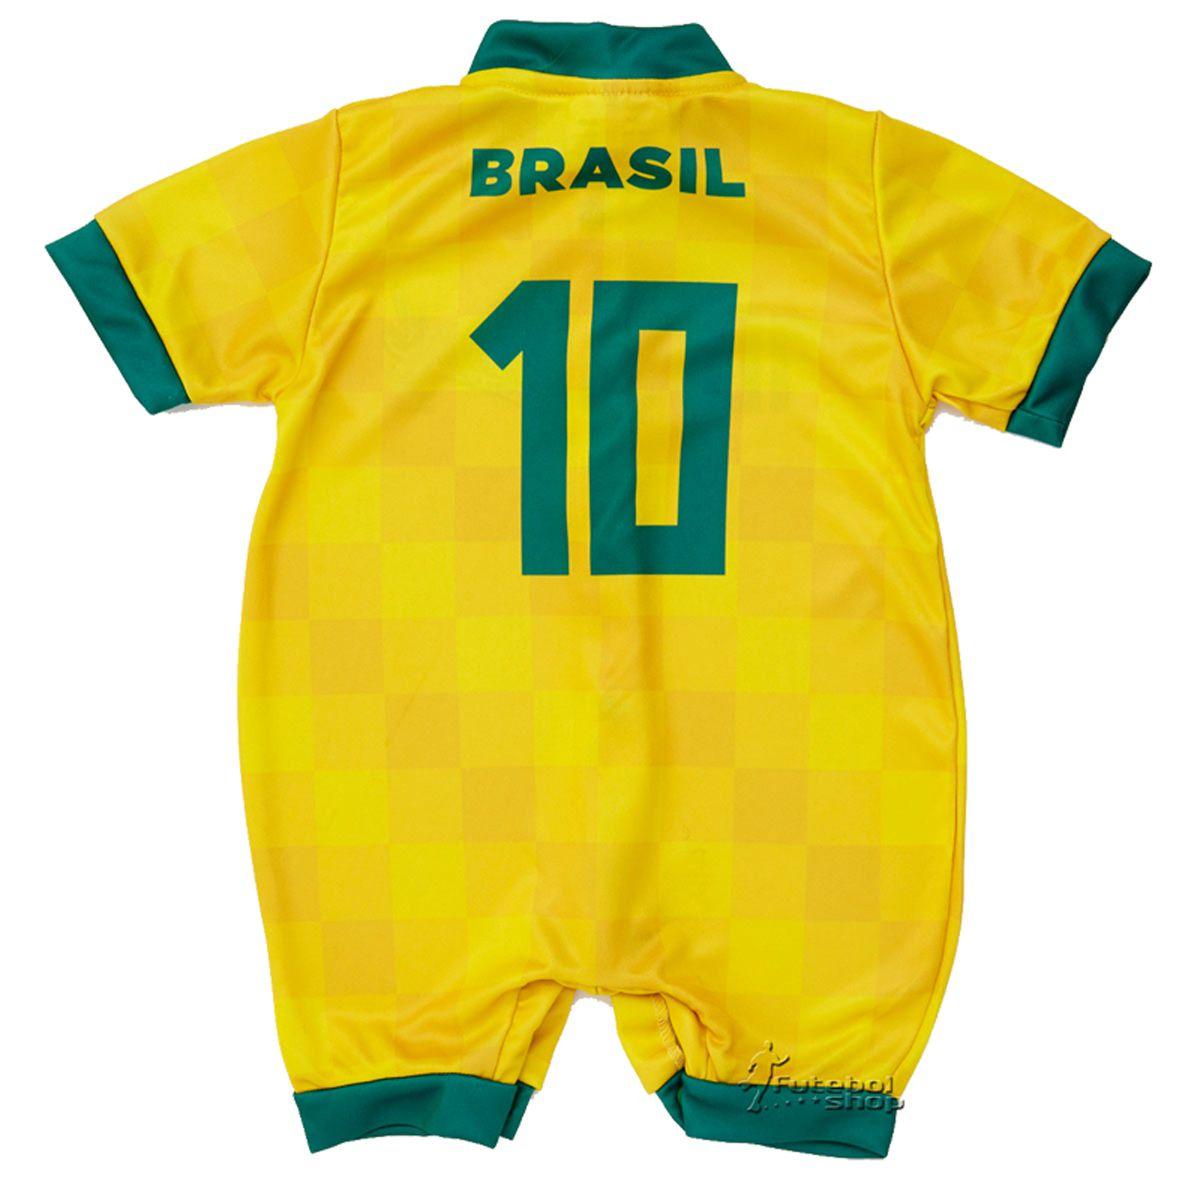 Macacão Curto Bebê Torcida Baby Brasil Estilo I - 005S